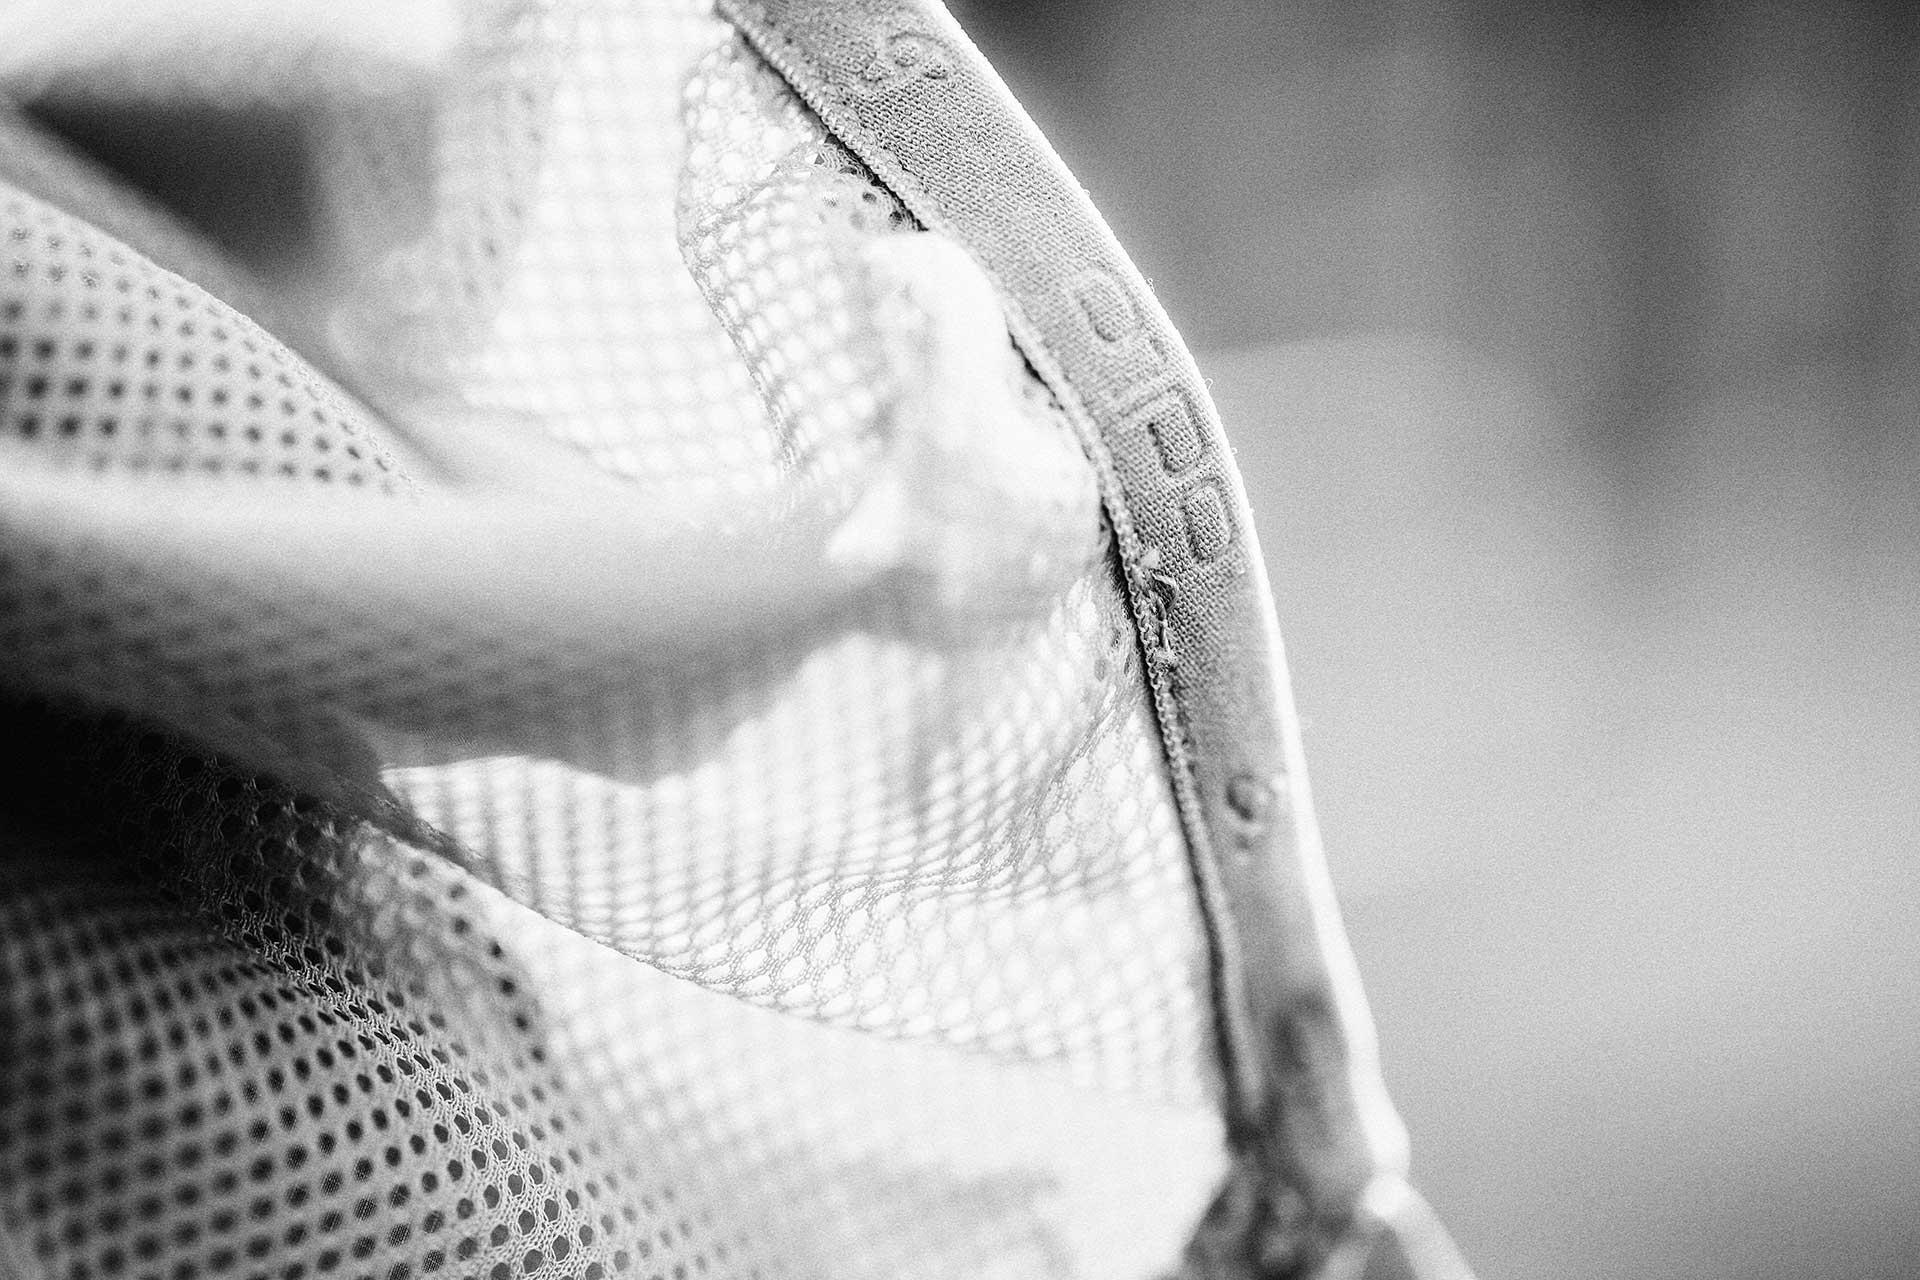 Detail Fotograf Motiv Sportbekleidung Running Urban Sport Lifestyle